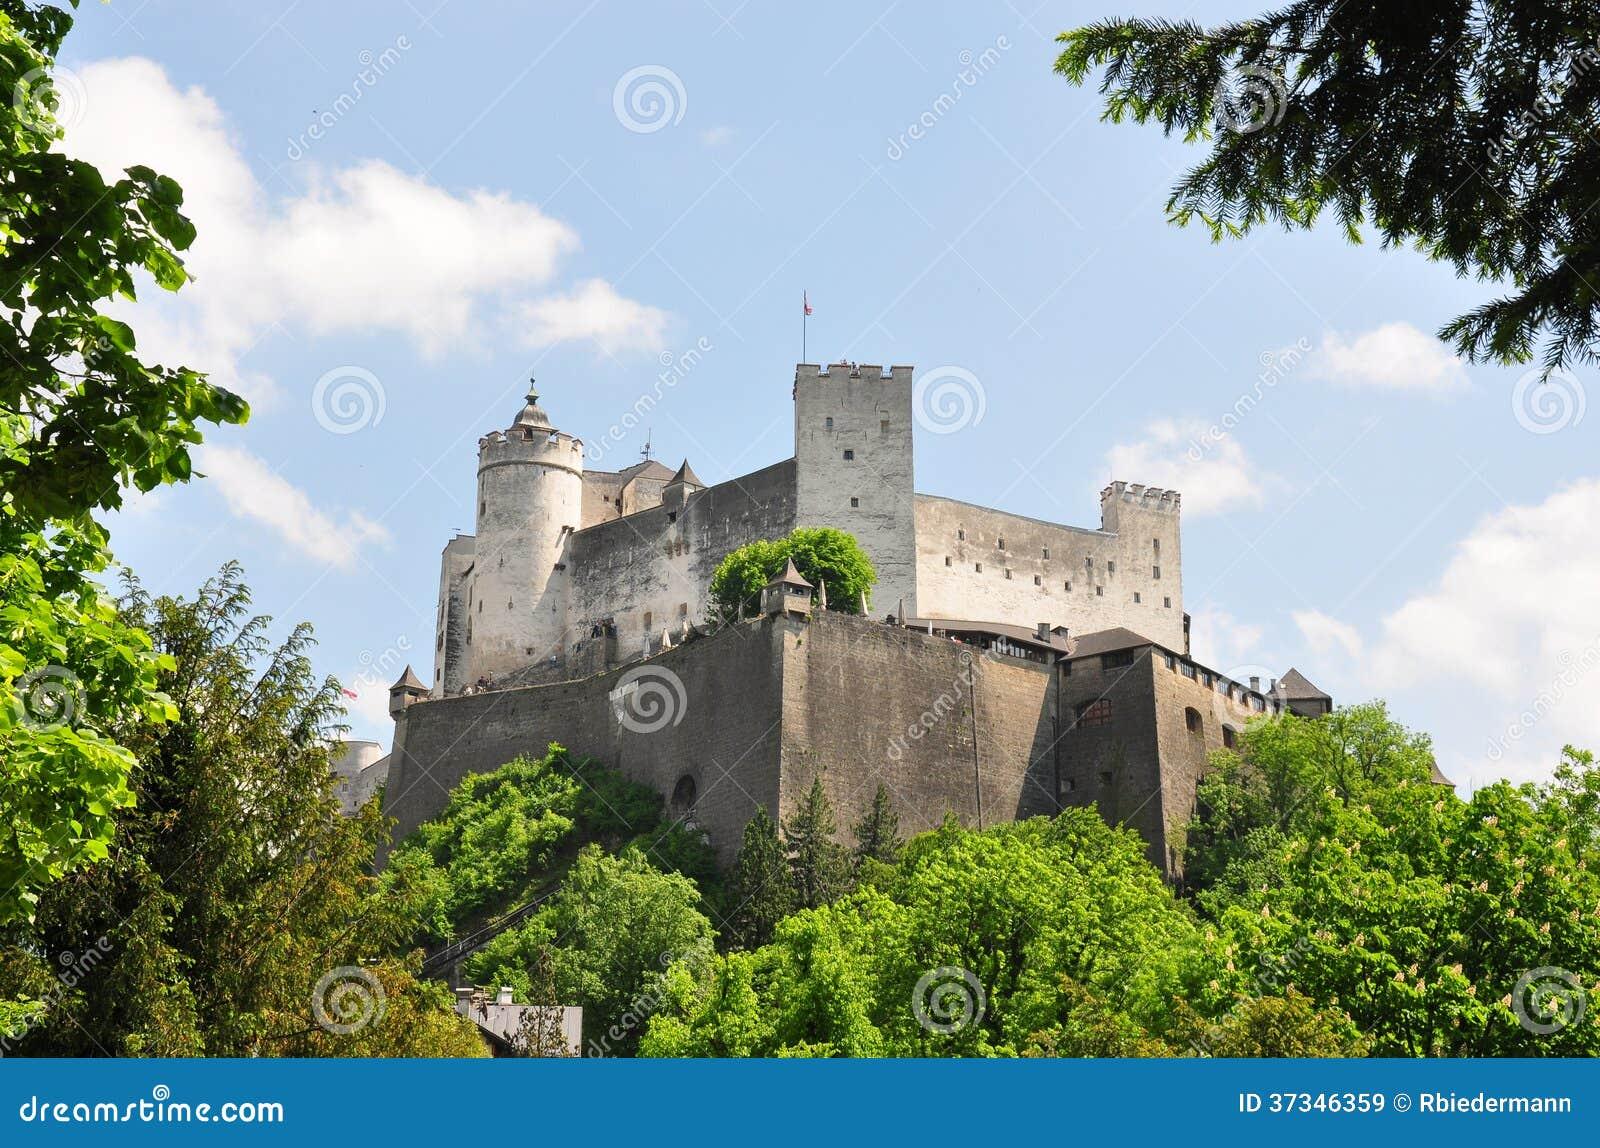 Festung Hohensalzburg i Salzburg